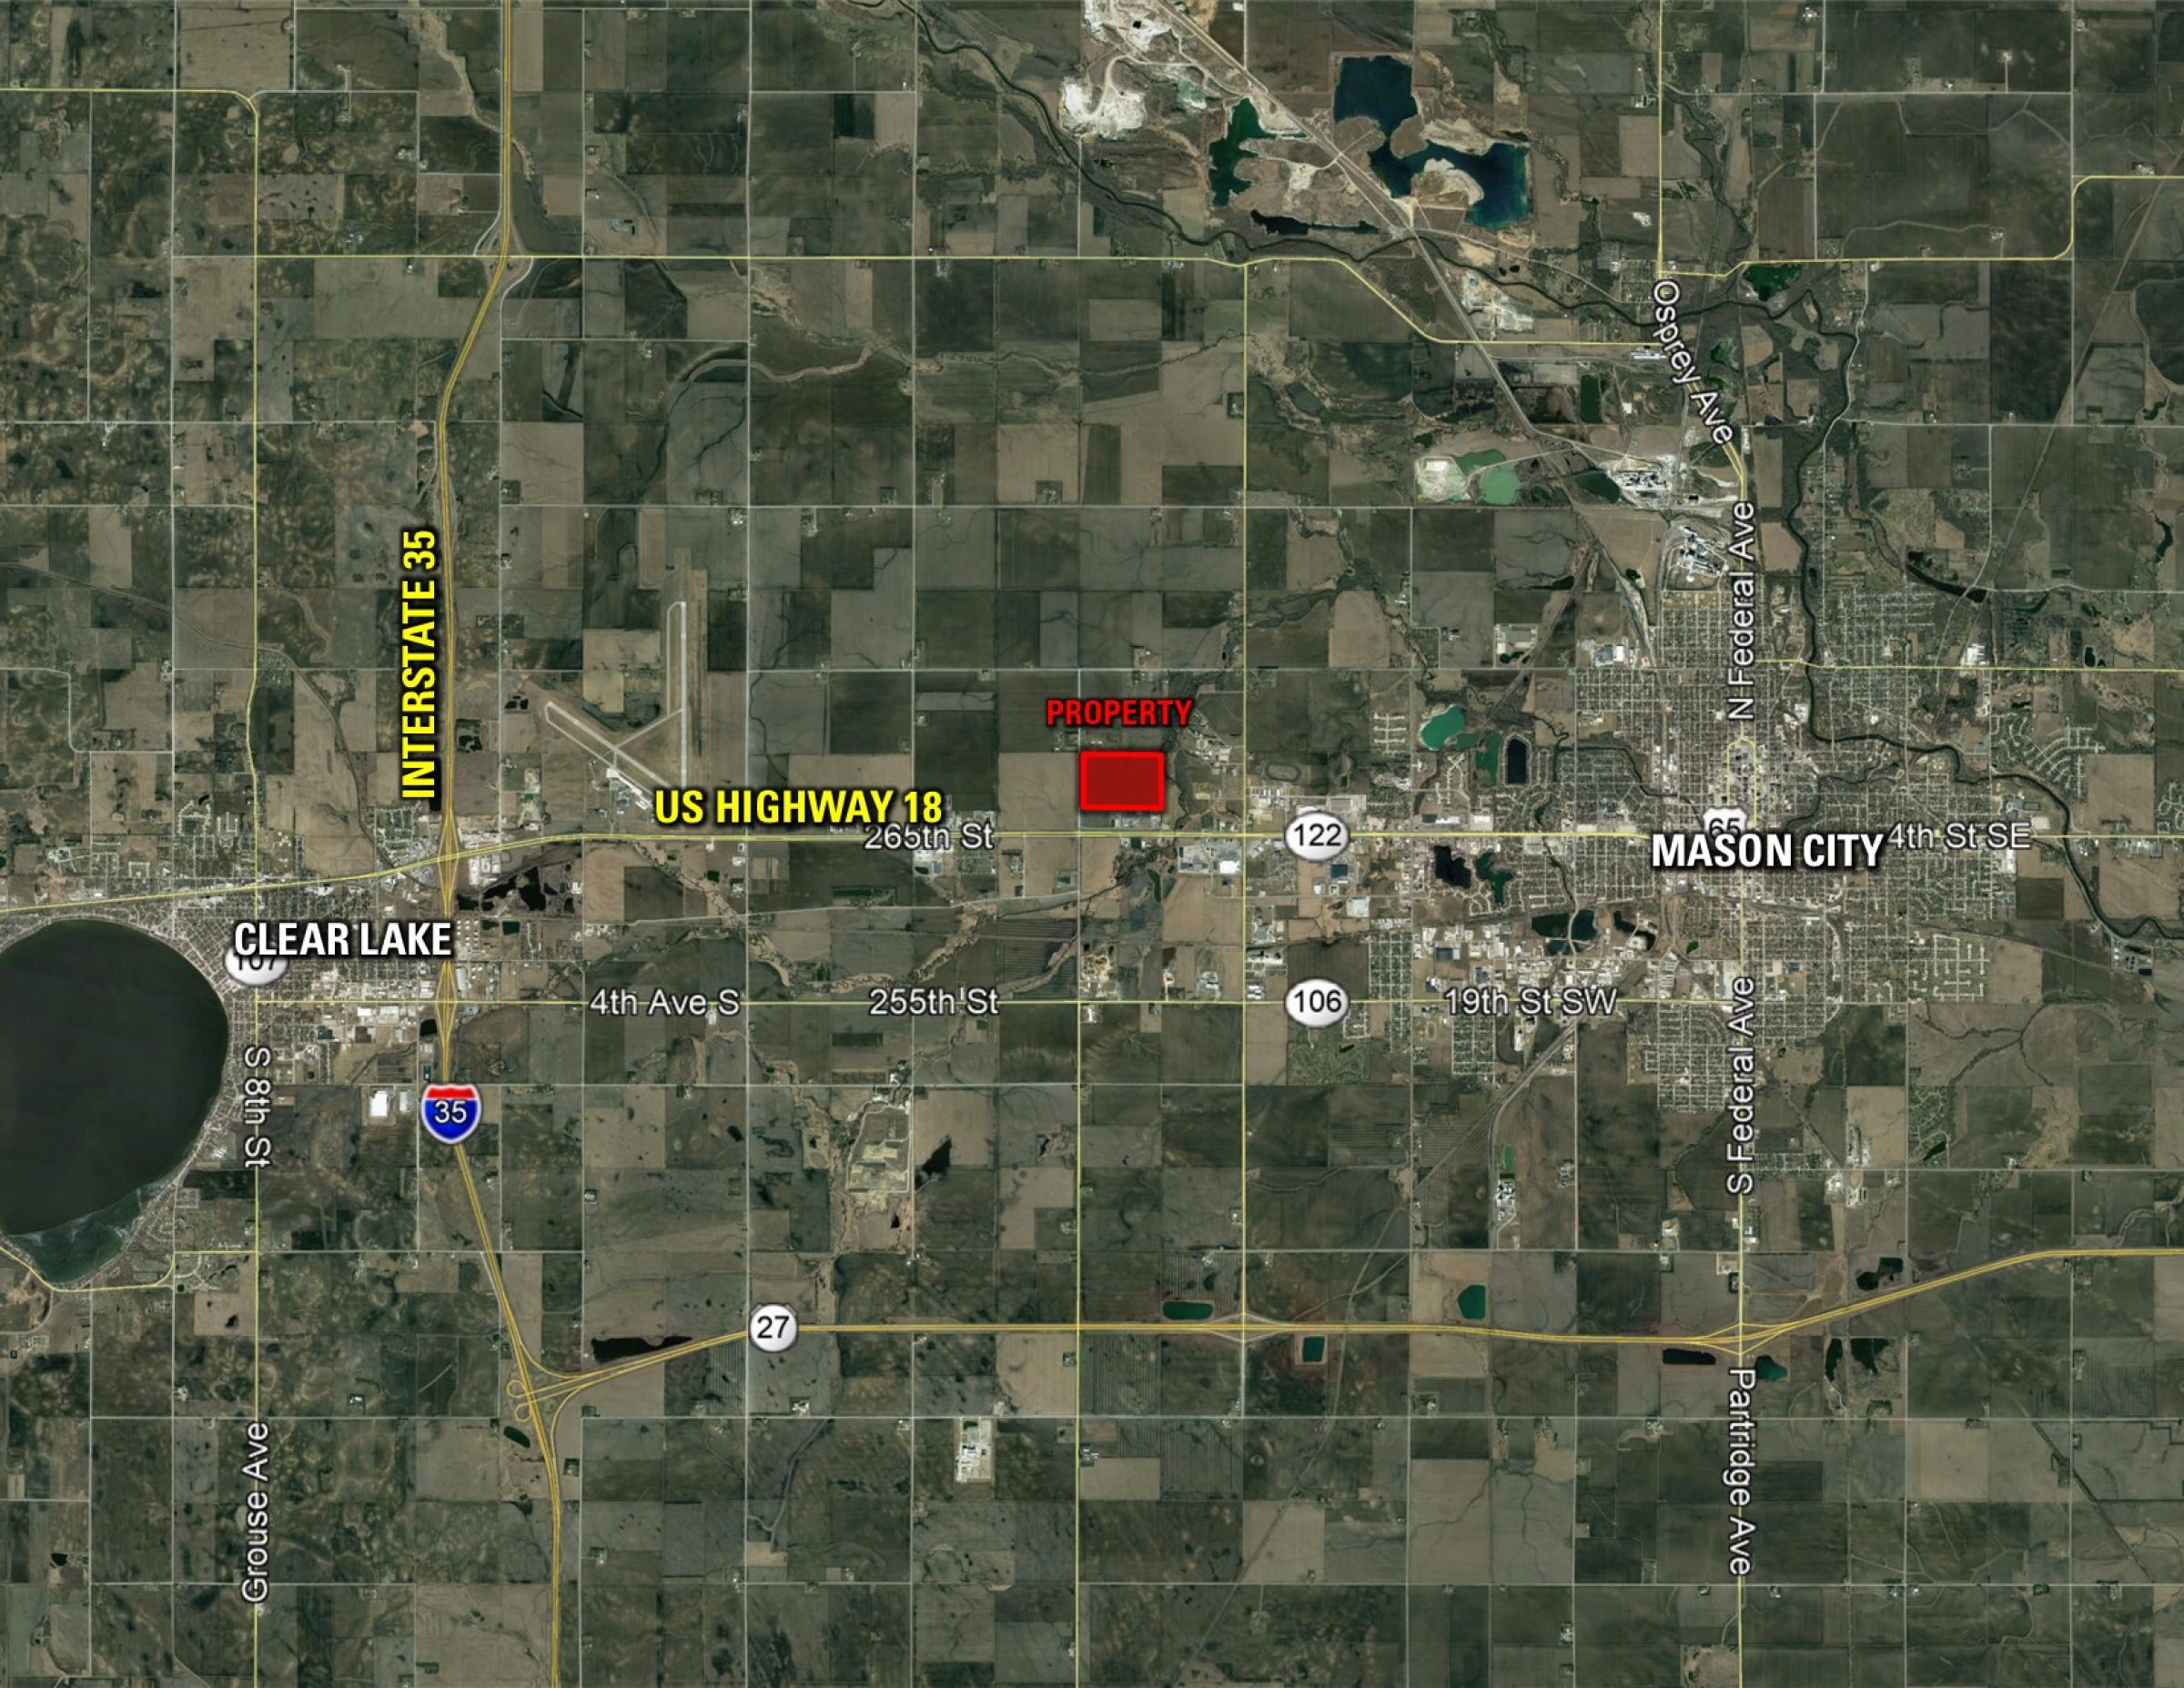 development-land-commercial-cerro-gordo-county-iowa-108-acres-listing-number-15644-0-2021-07-20-031412.jpg